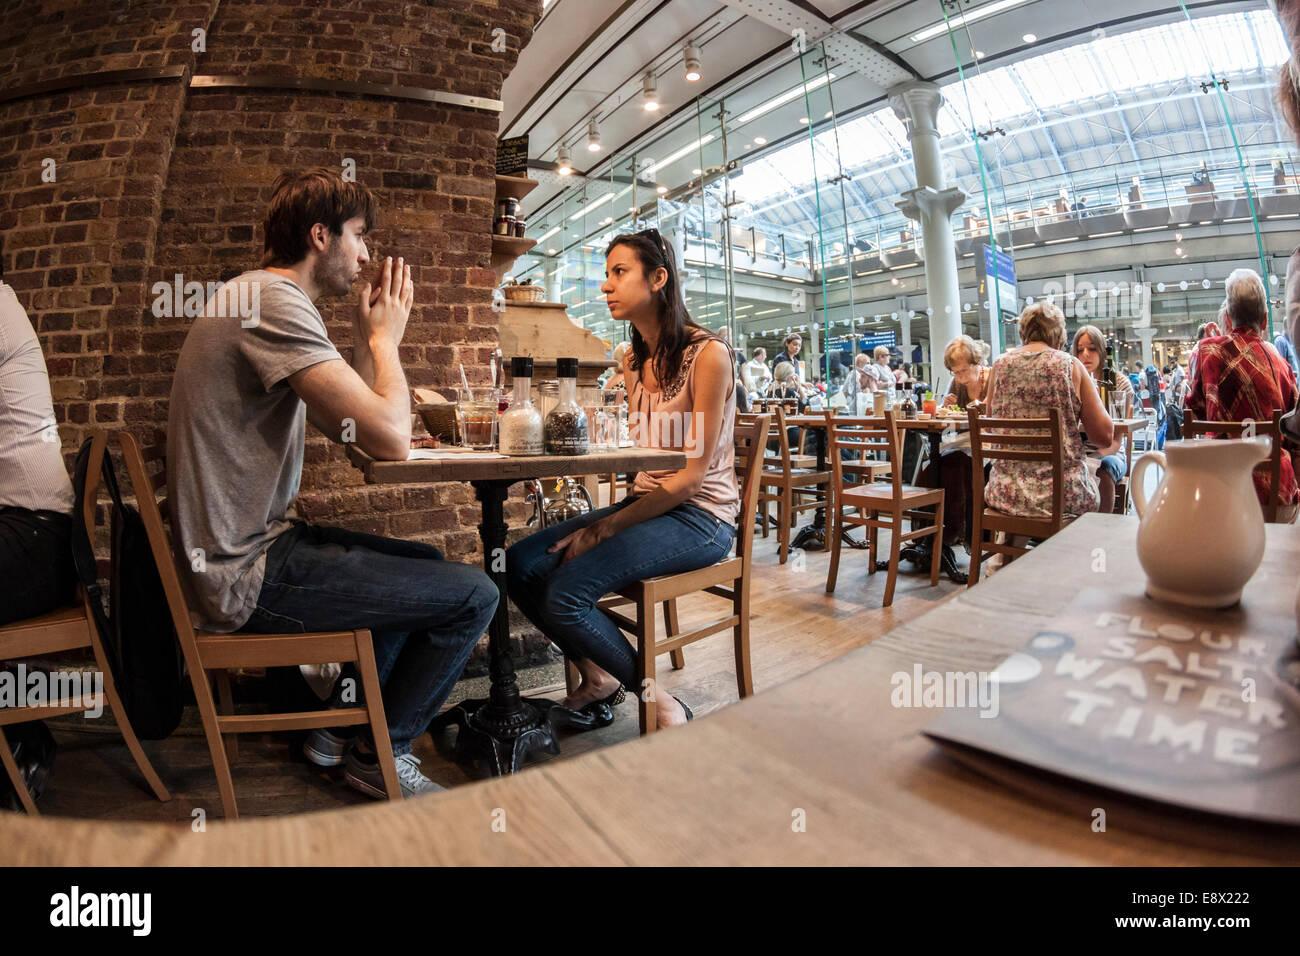 Station Cafe, St Pancras International, London - Stock Image